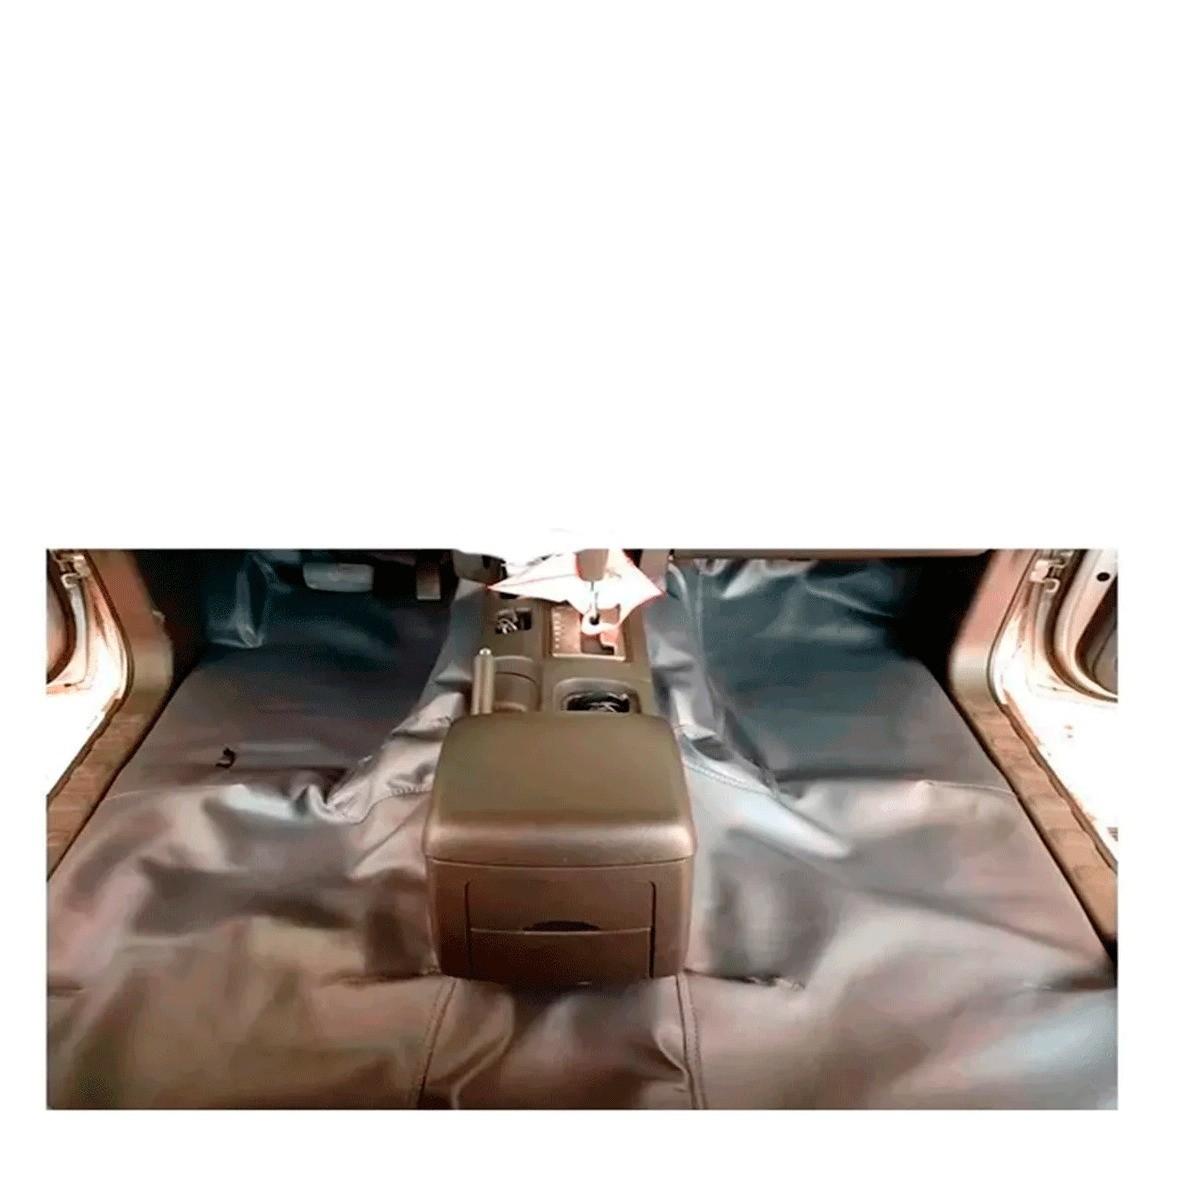 Tapete Automotivo Assoalho Emborrachado Bidim Volkswagen Saveiro Simples G5 G6 G7